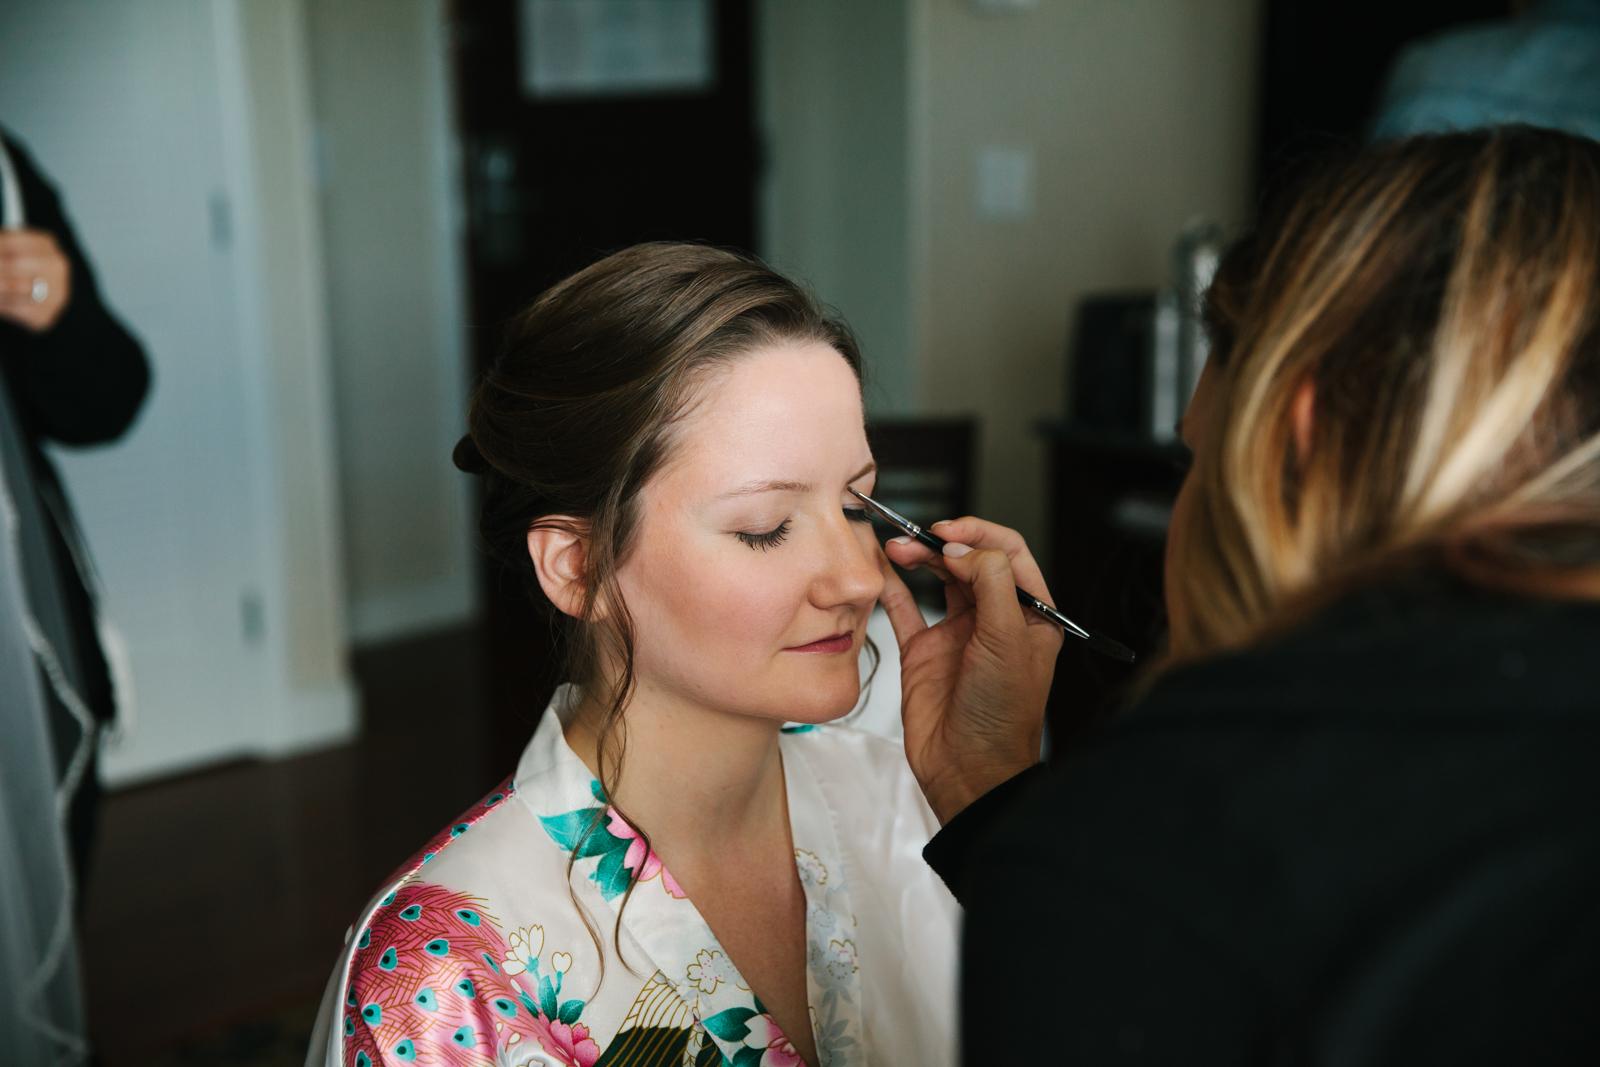 Eastons-Beach-Rotunda-Ballroom-Wedding-Newport-Rhode-Island-PhotographybyAmandaMorgan-13.jpg